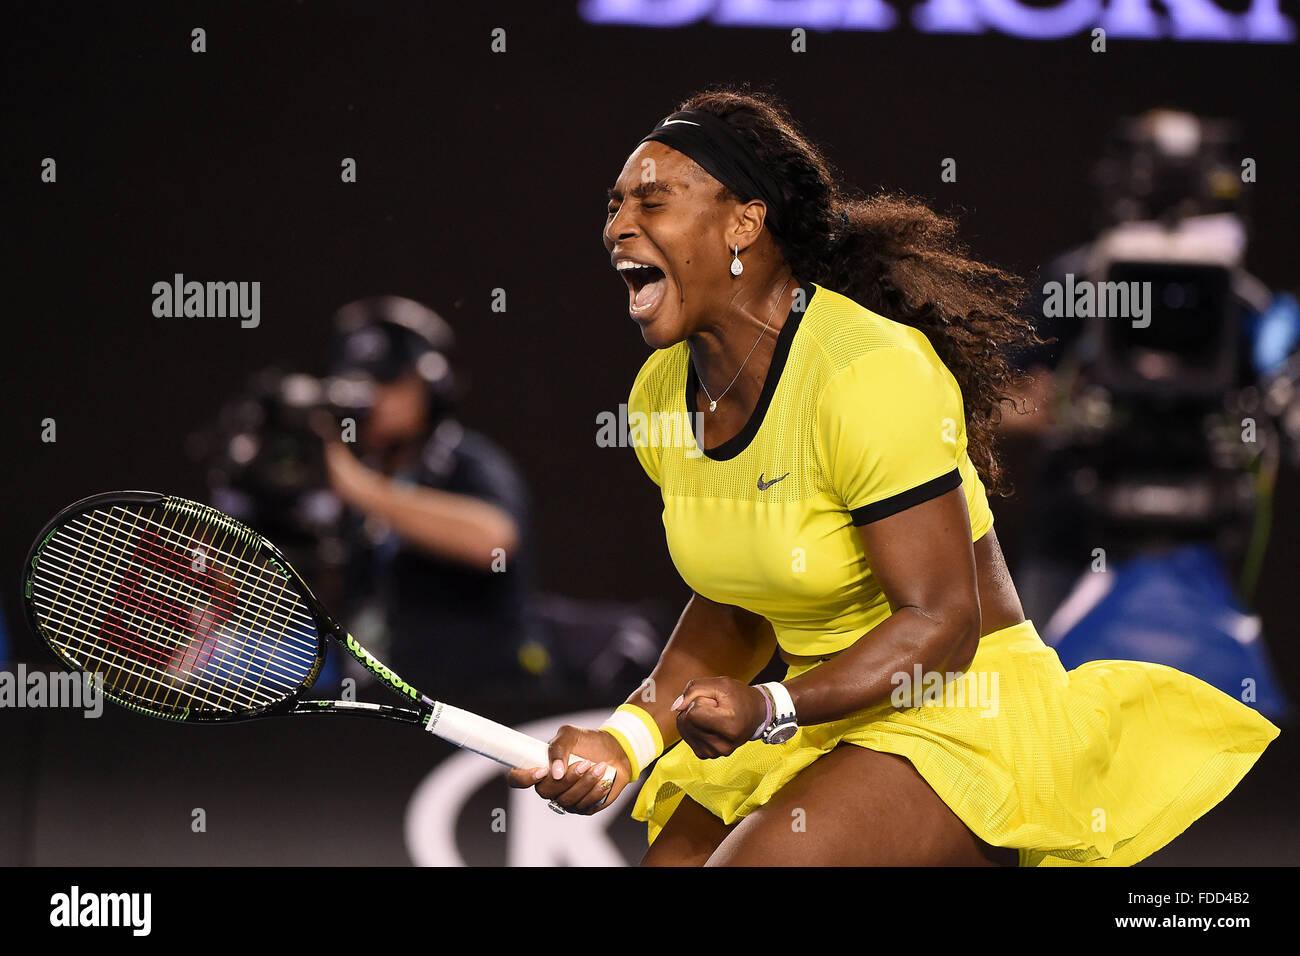 Melbourne Park, Melbourne, Australien. 30. Januar 2016. Australian Open Damen Einzel Finale Serena Williams gegen Stockbild